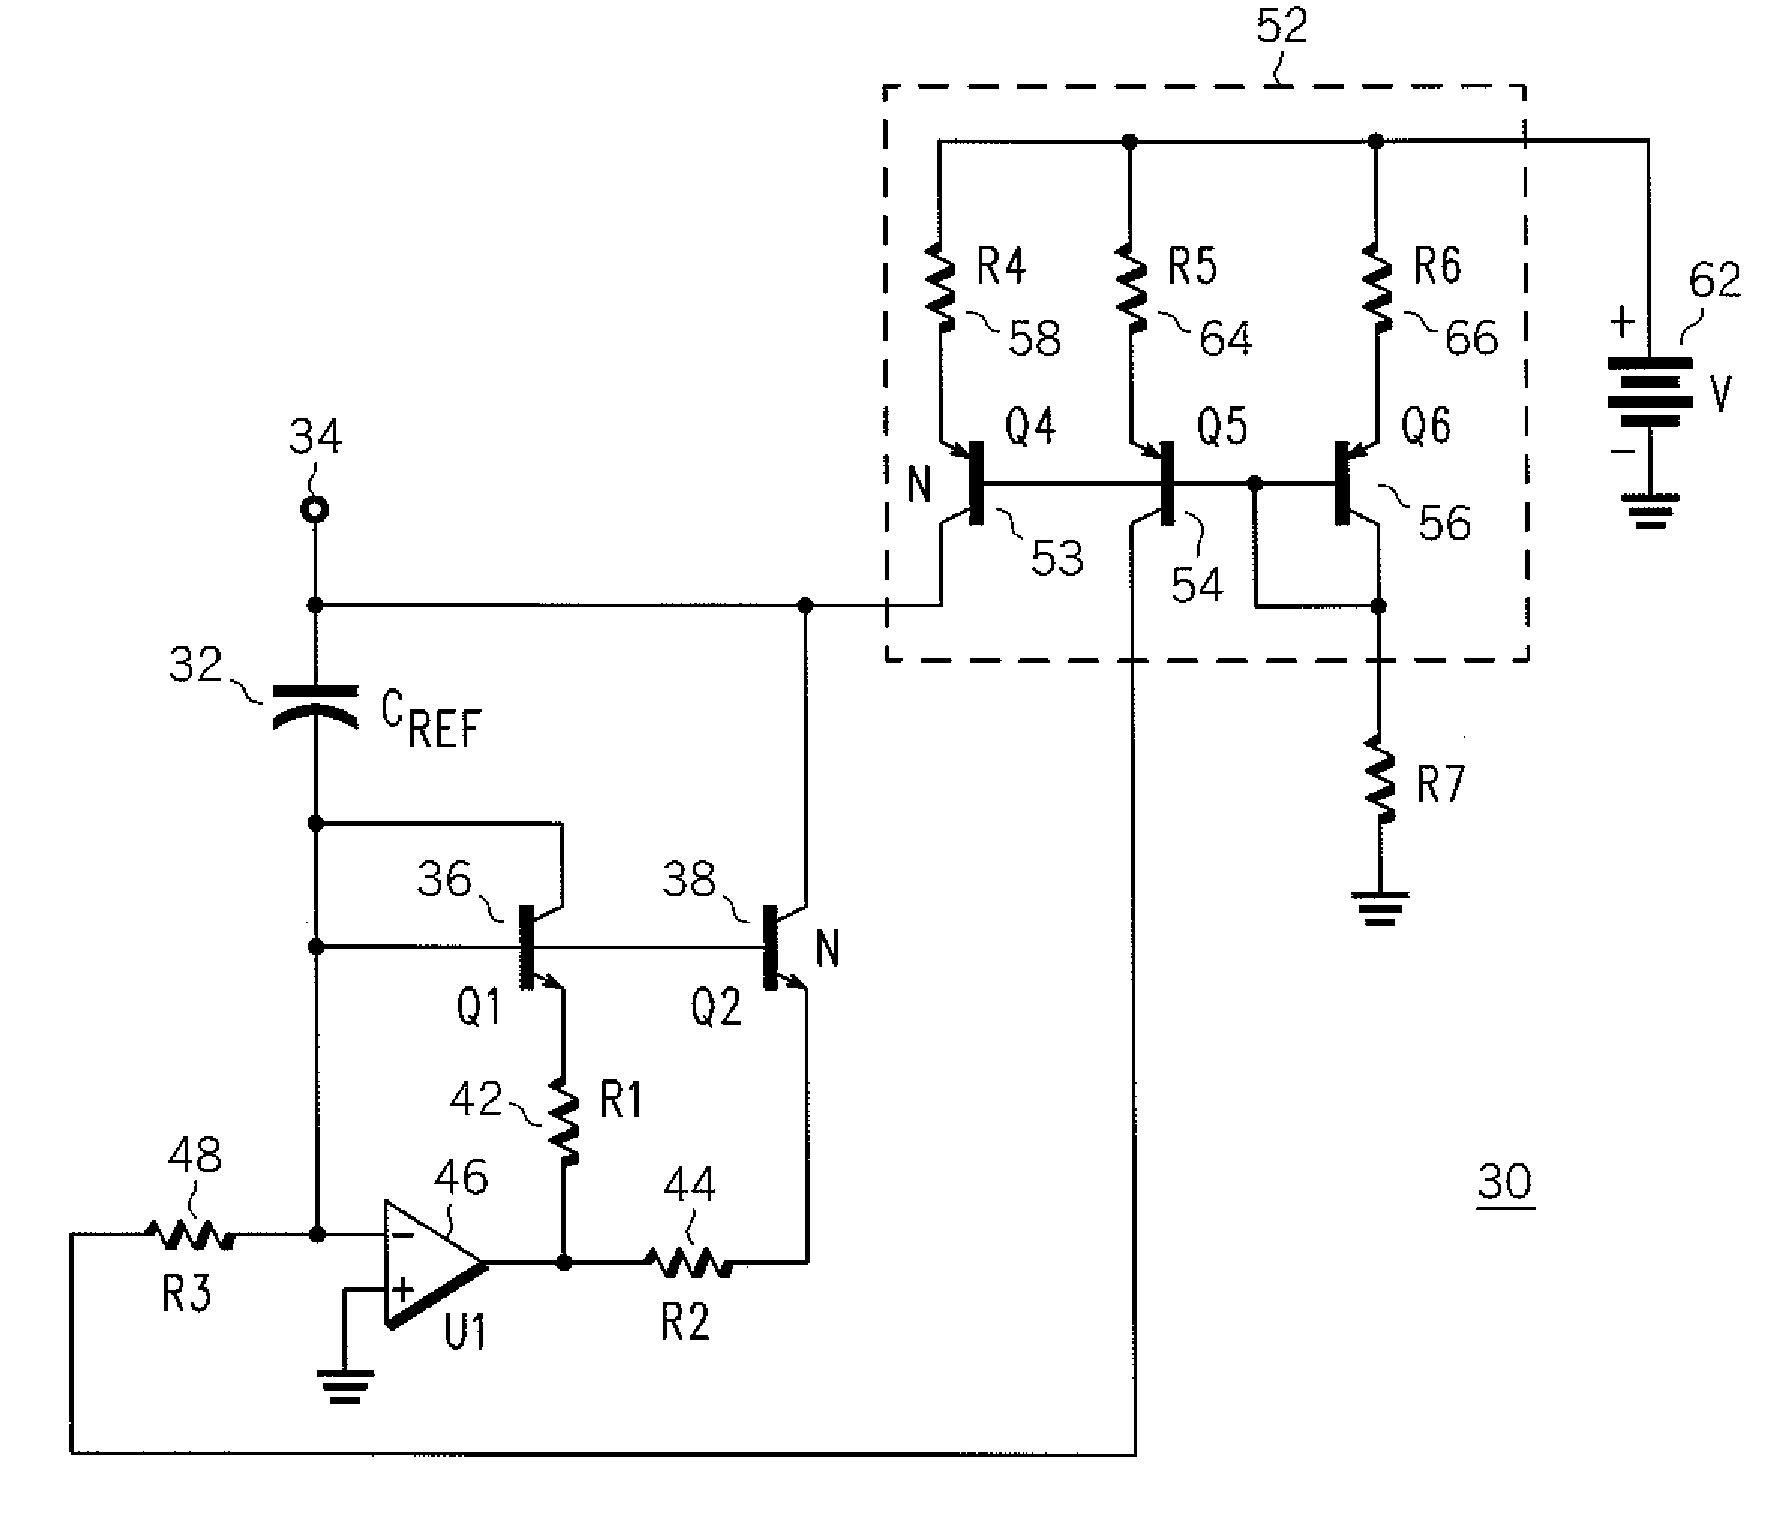 the capacitance multiplier